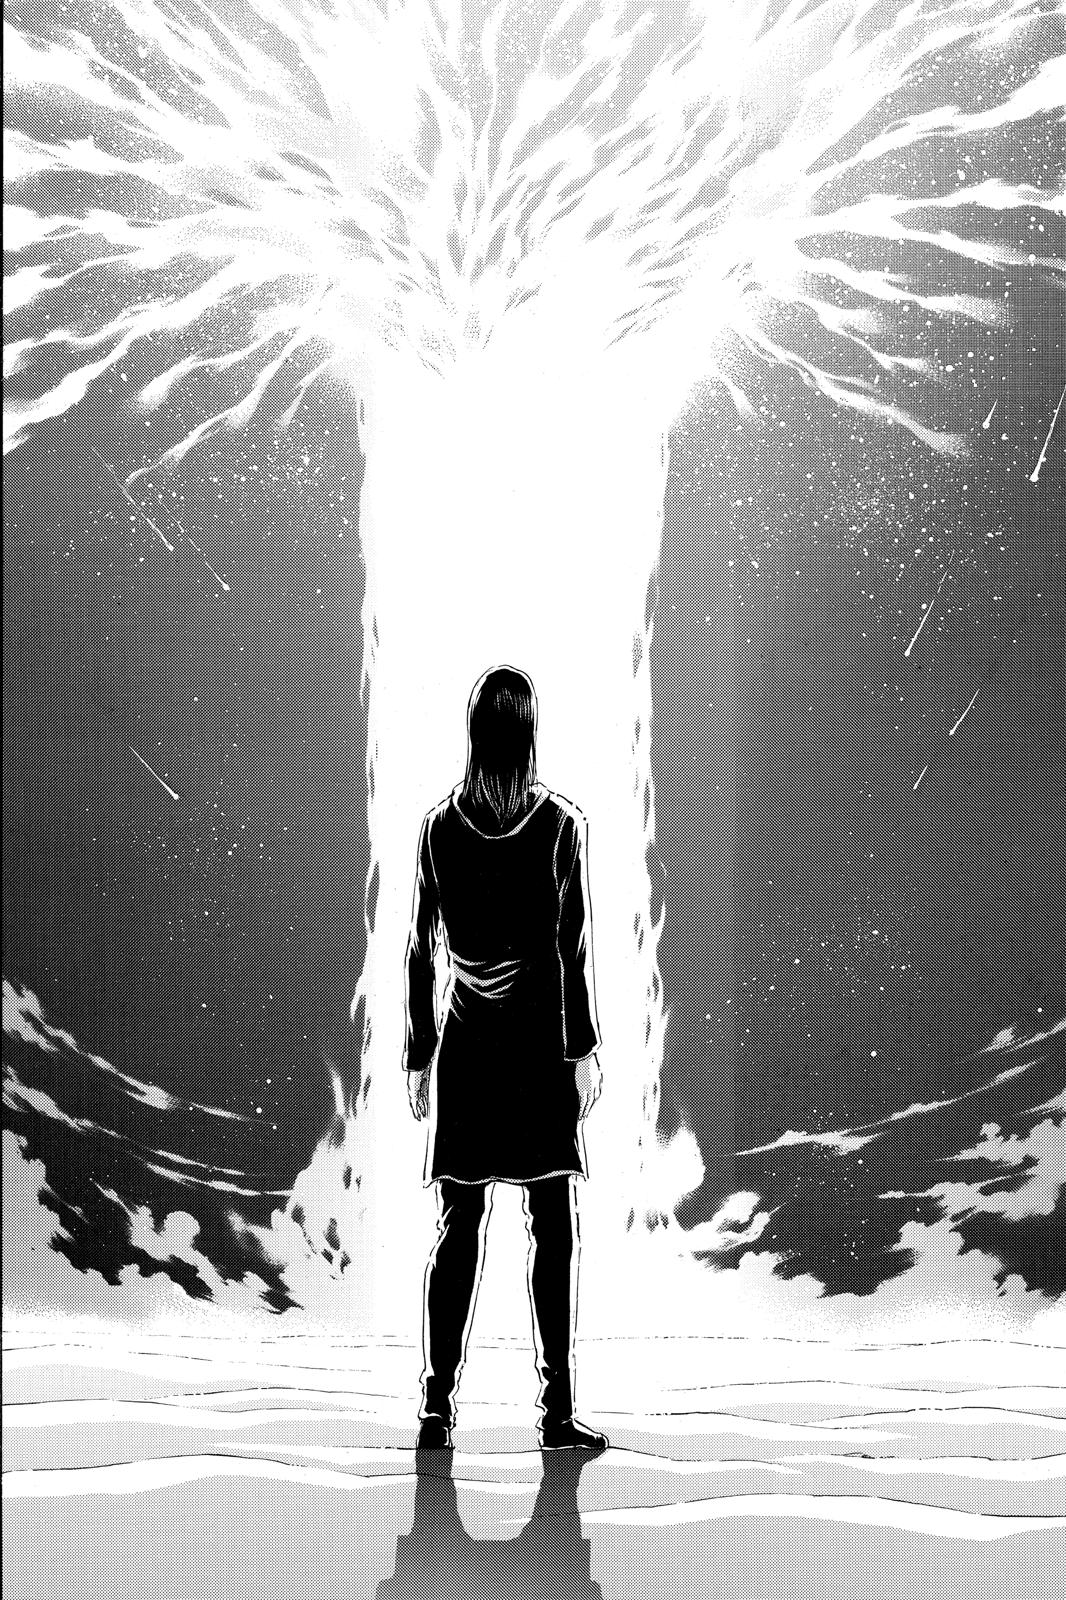 Attack On Titan, Episode 120 image 010